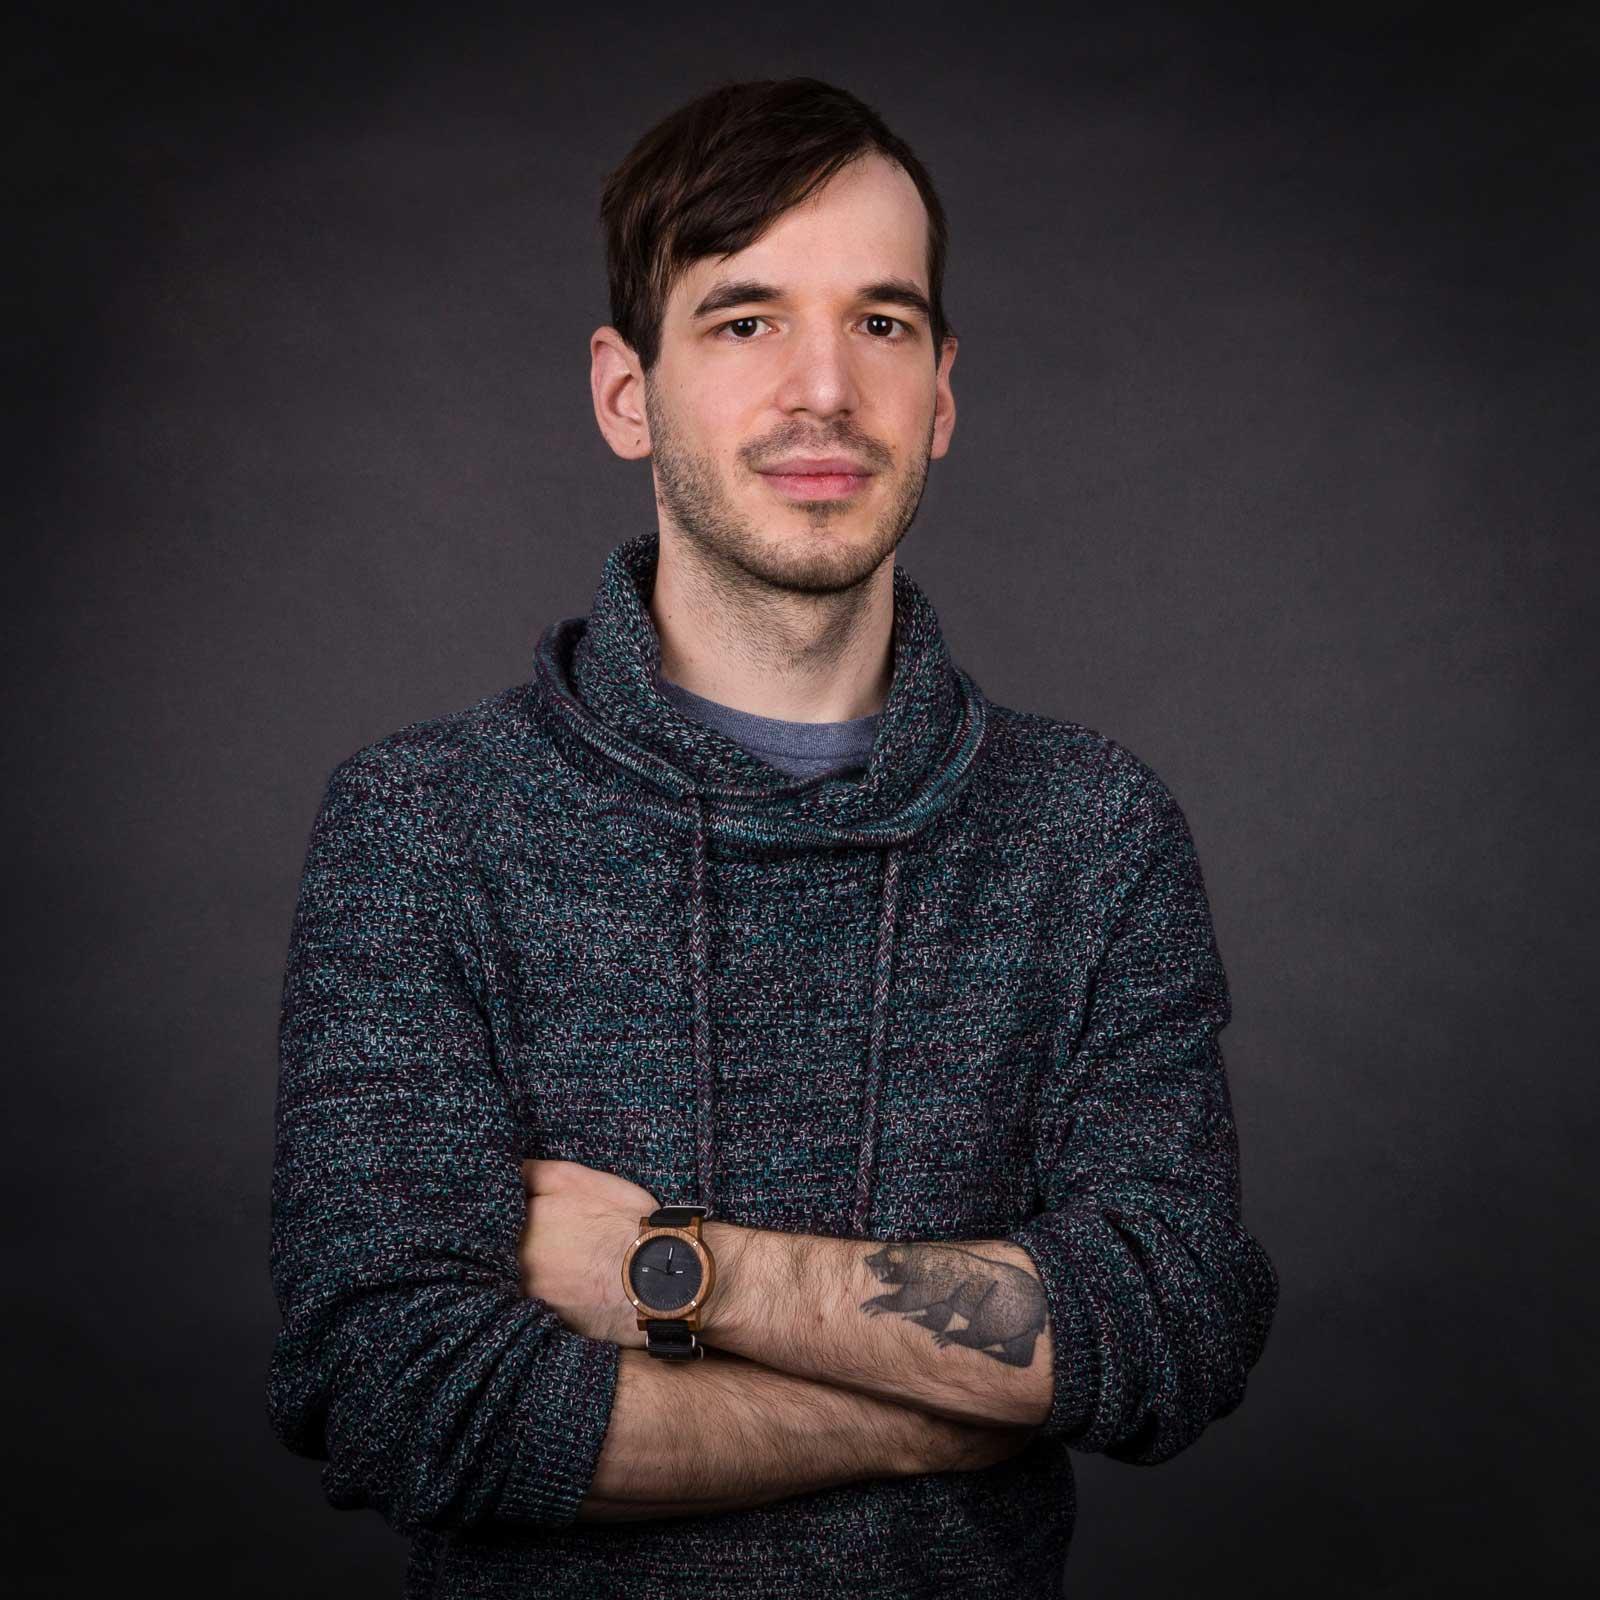 Marek Szmyt AppUnite Design team